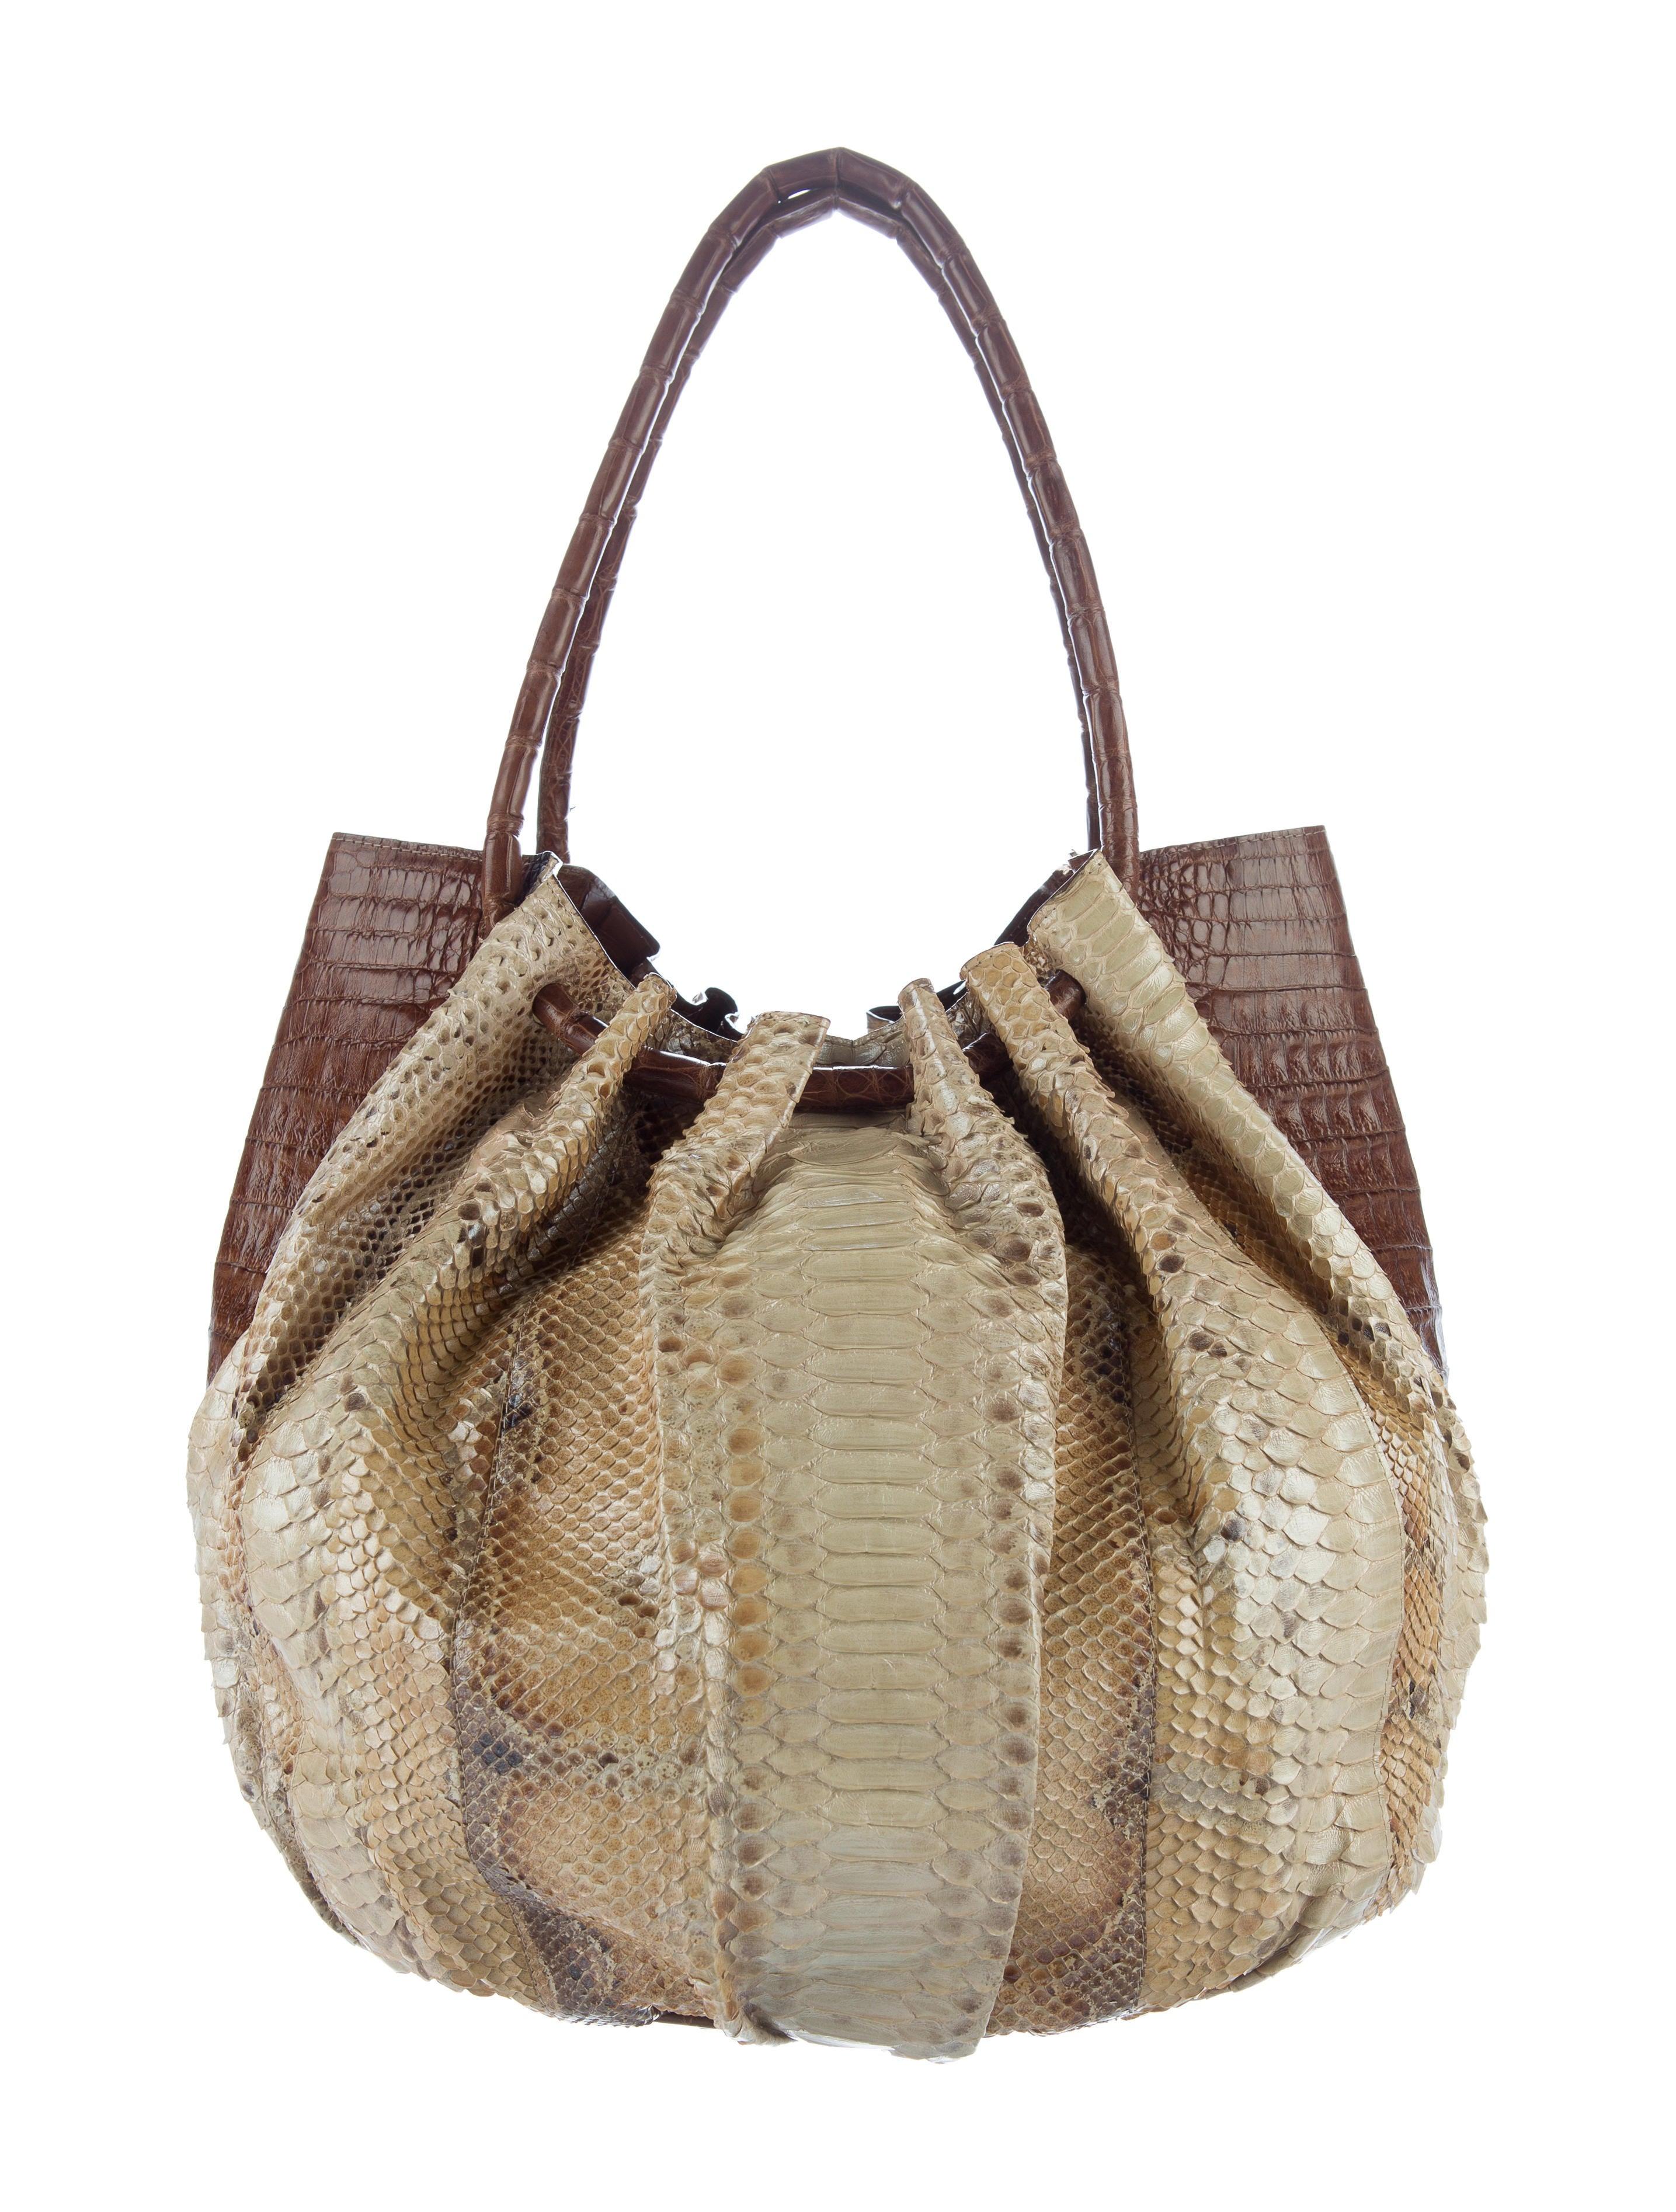 Nancy gonzalez crocodile trimmed python tote handbags for Nancy gonzalez crocodile tote